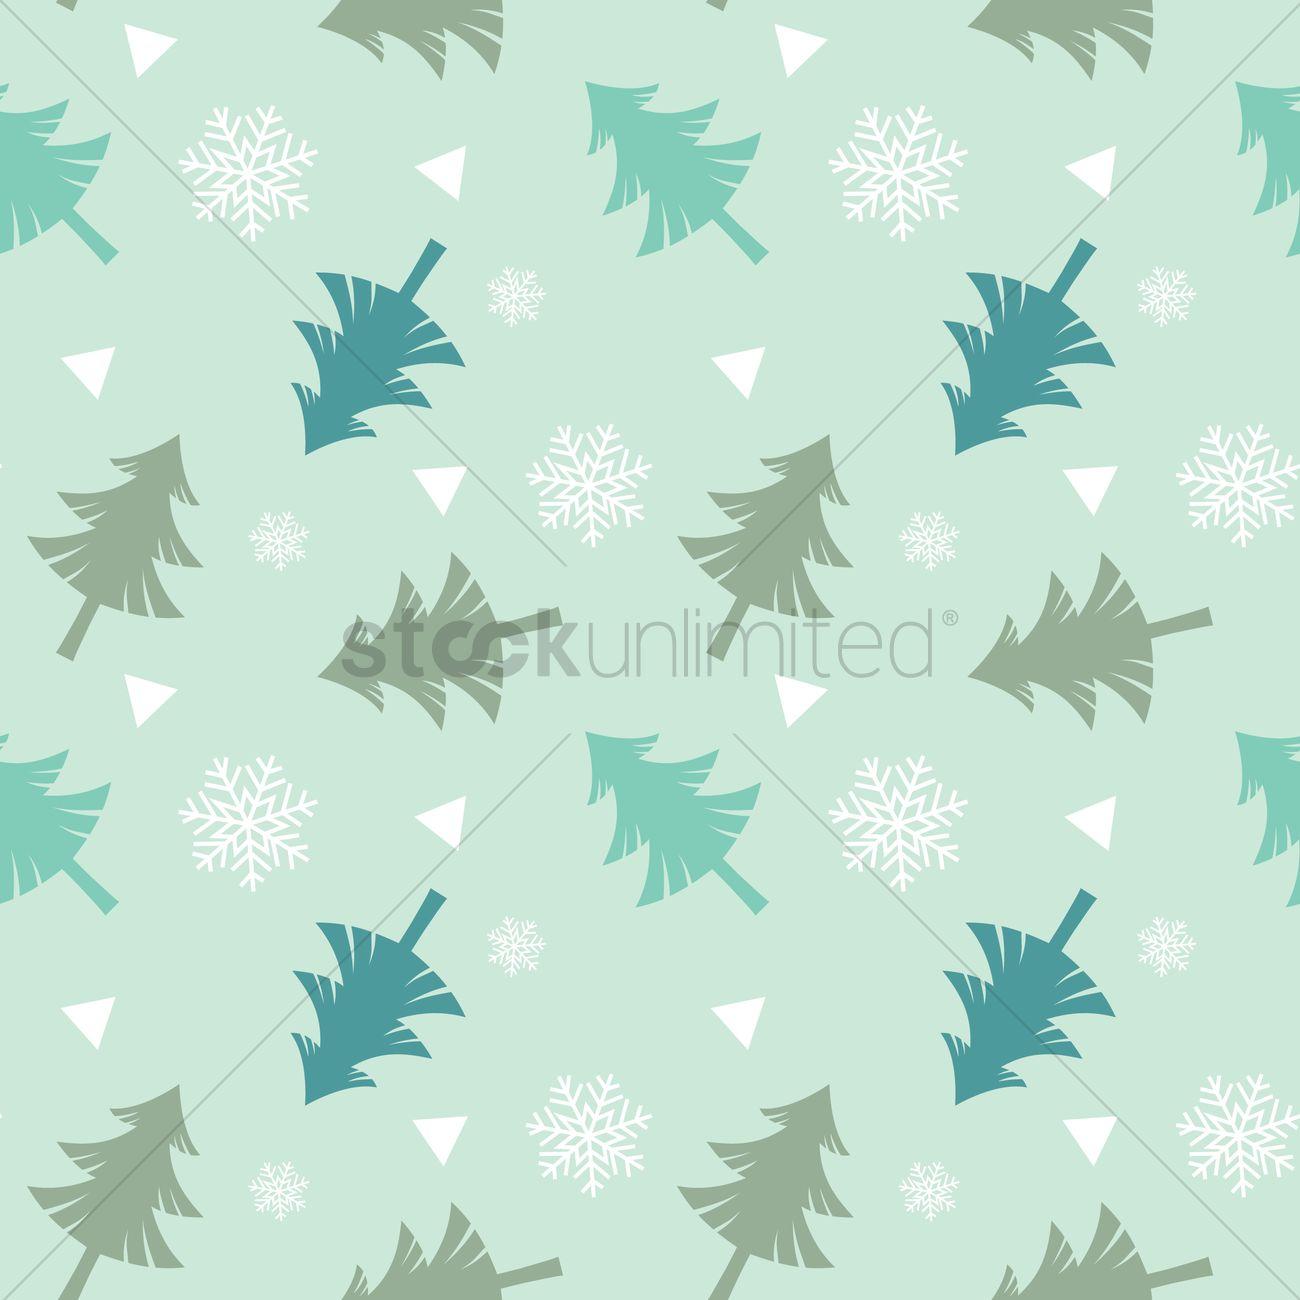 Christmas Backround.Christmas Background Design Vector Image 1974595